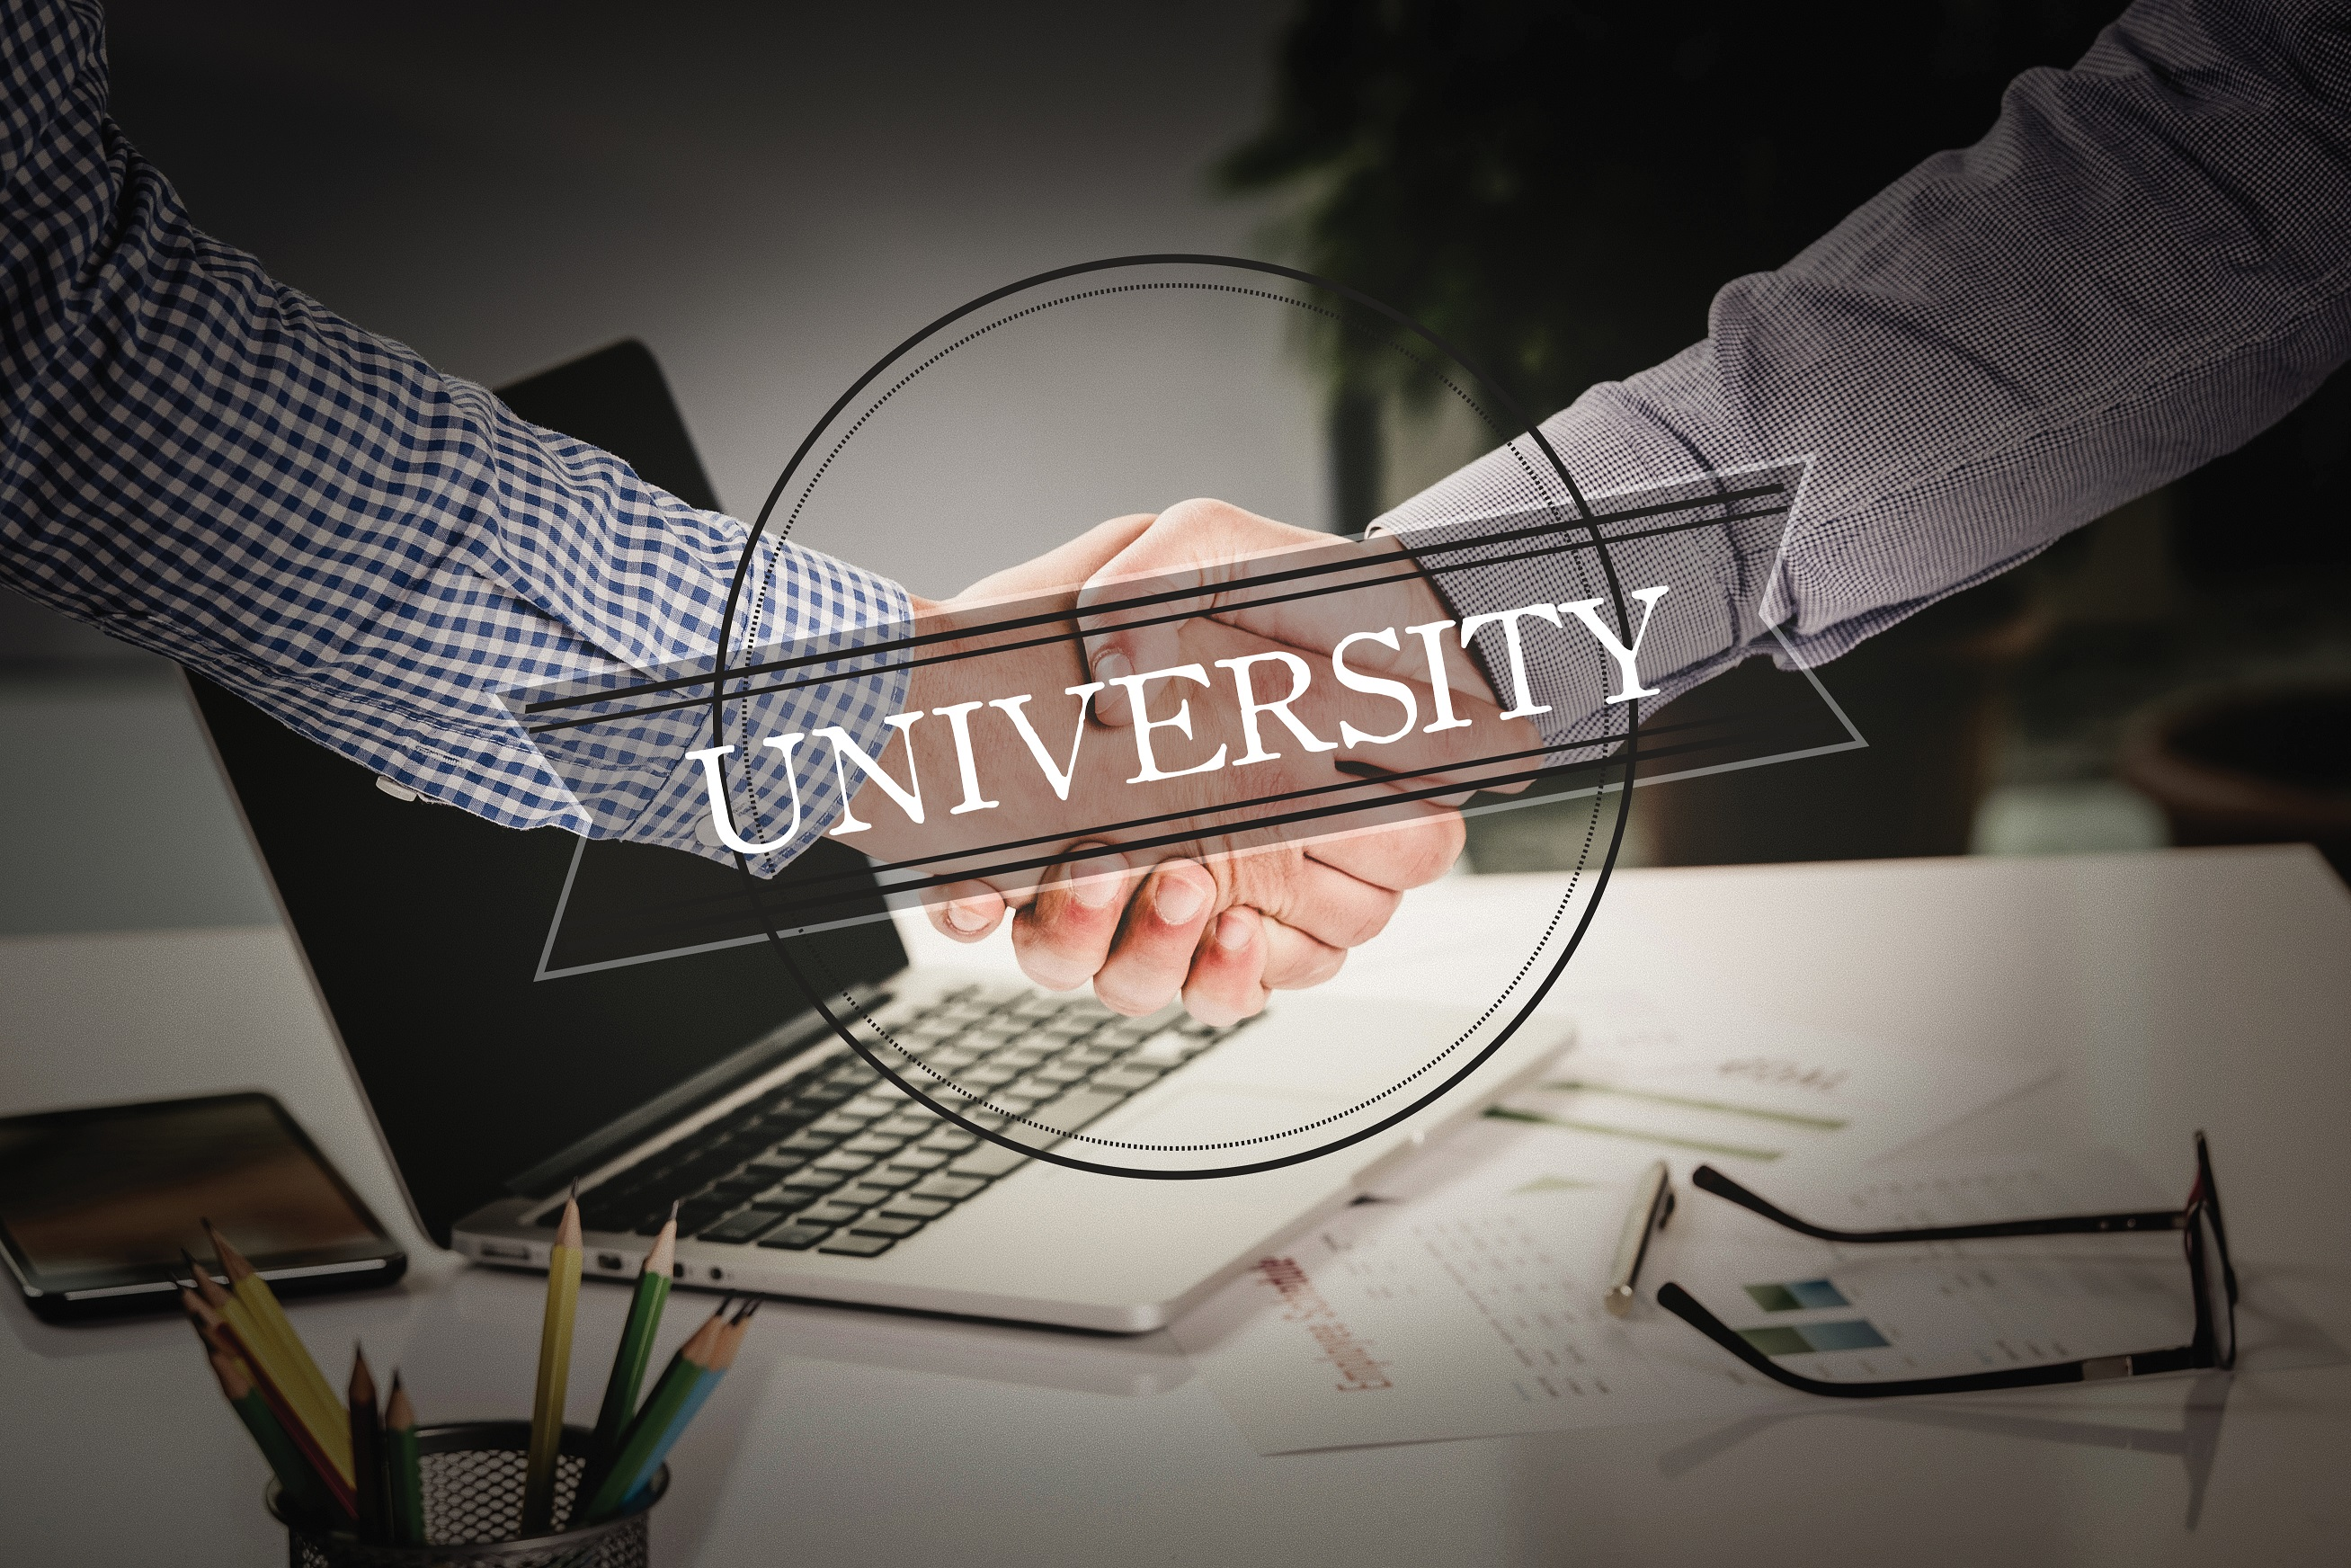 University partnership